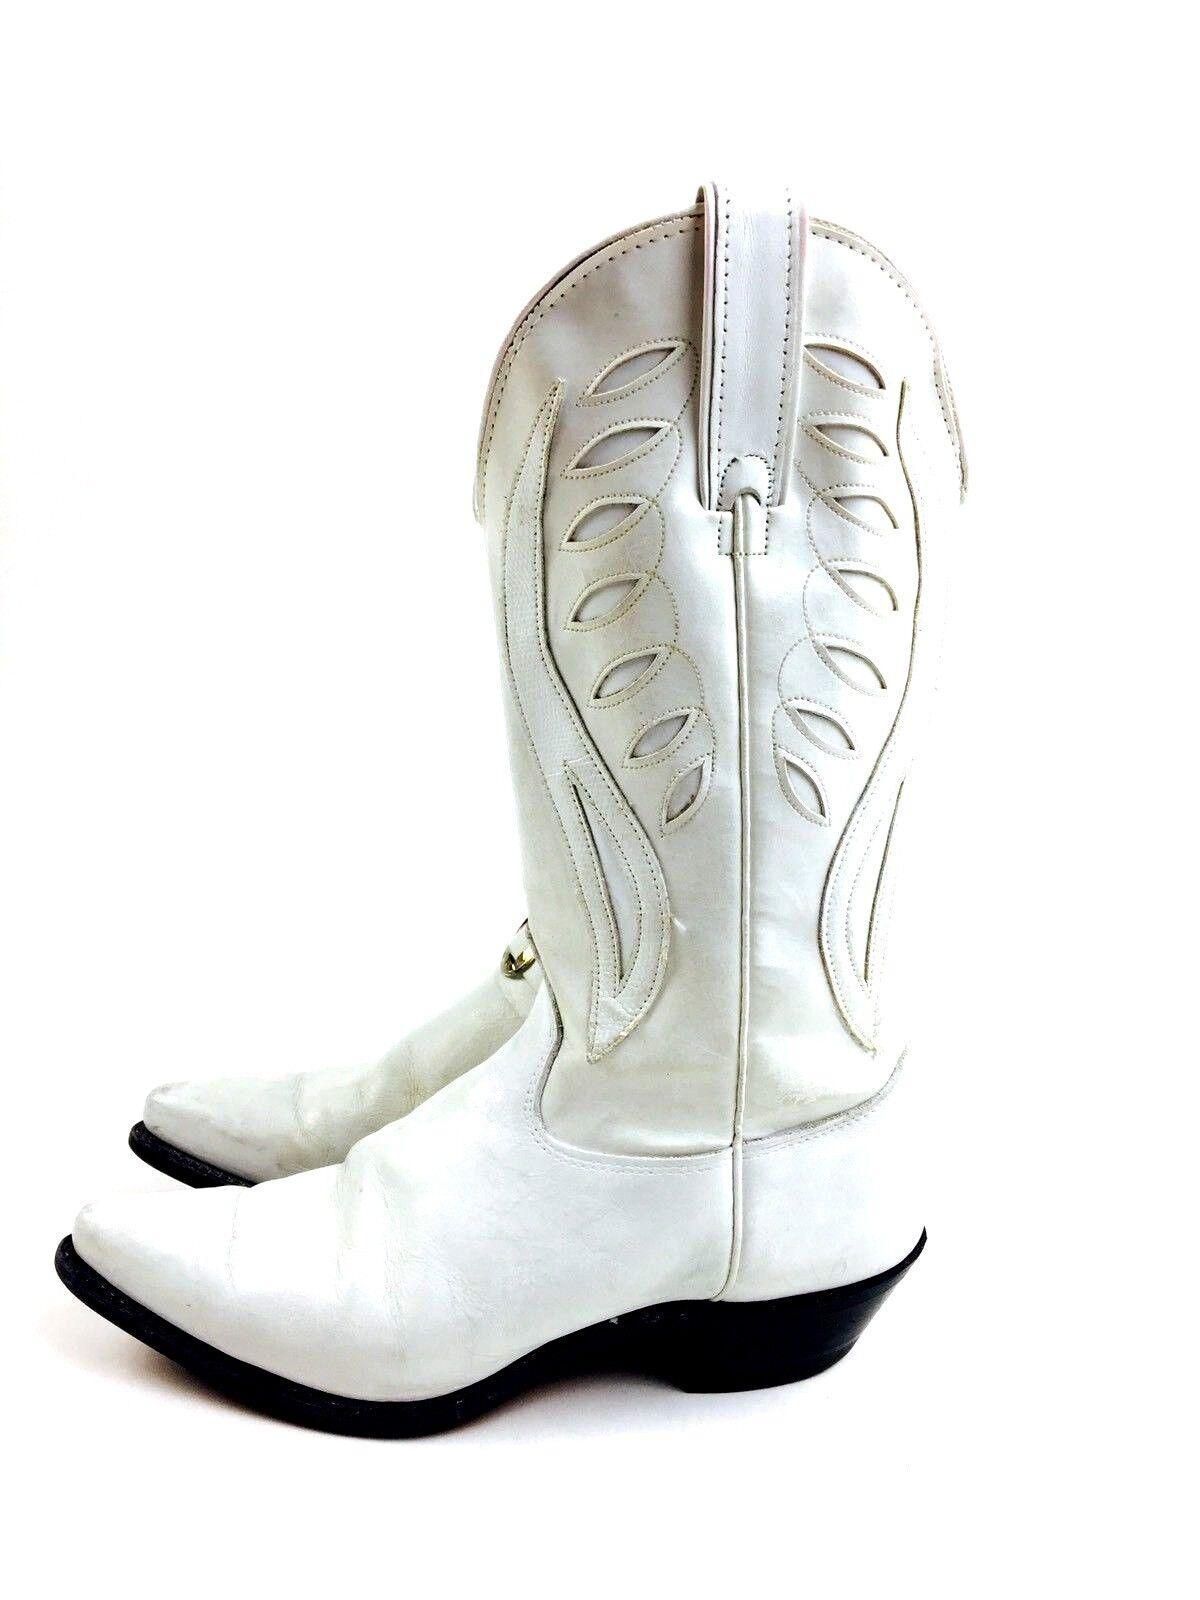 White Cowboy Boots Women's Shoes Women's Boots He… - image 5